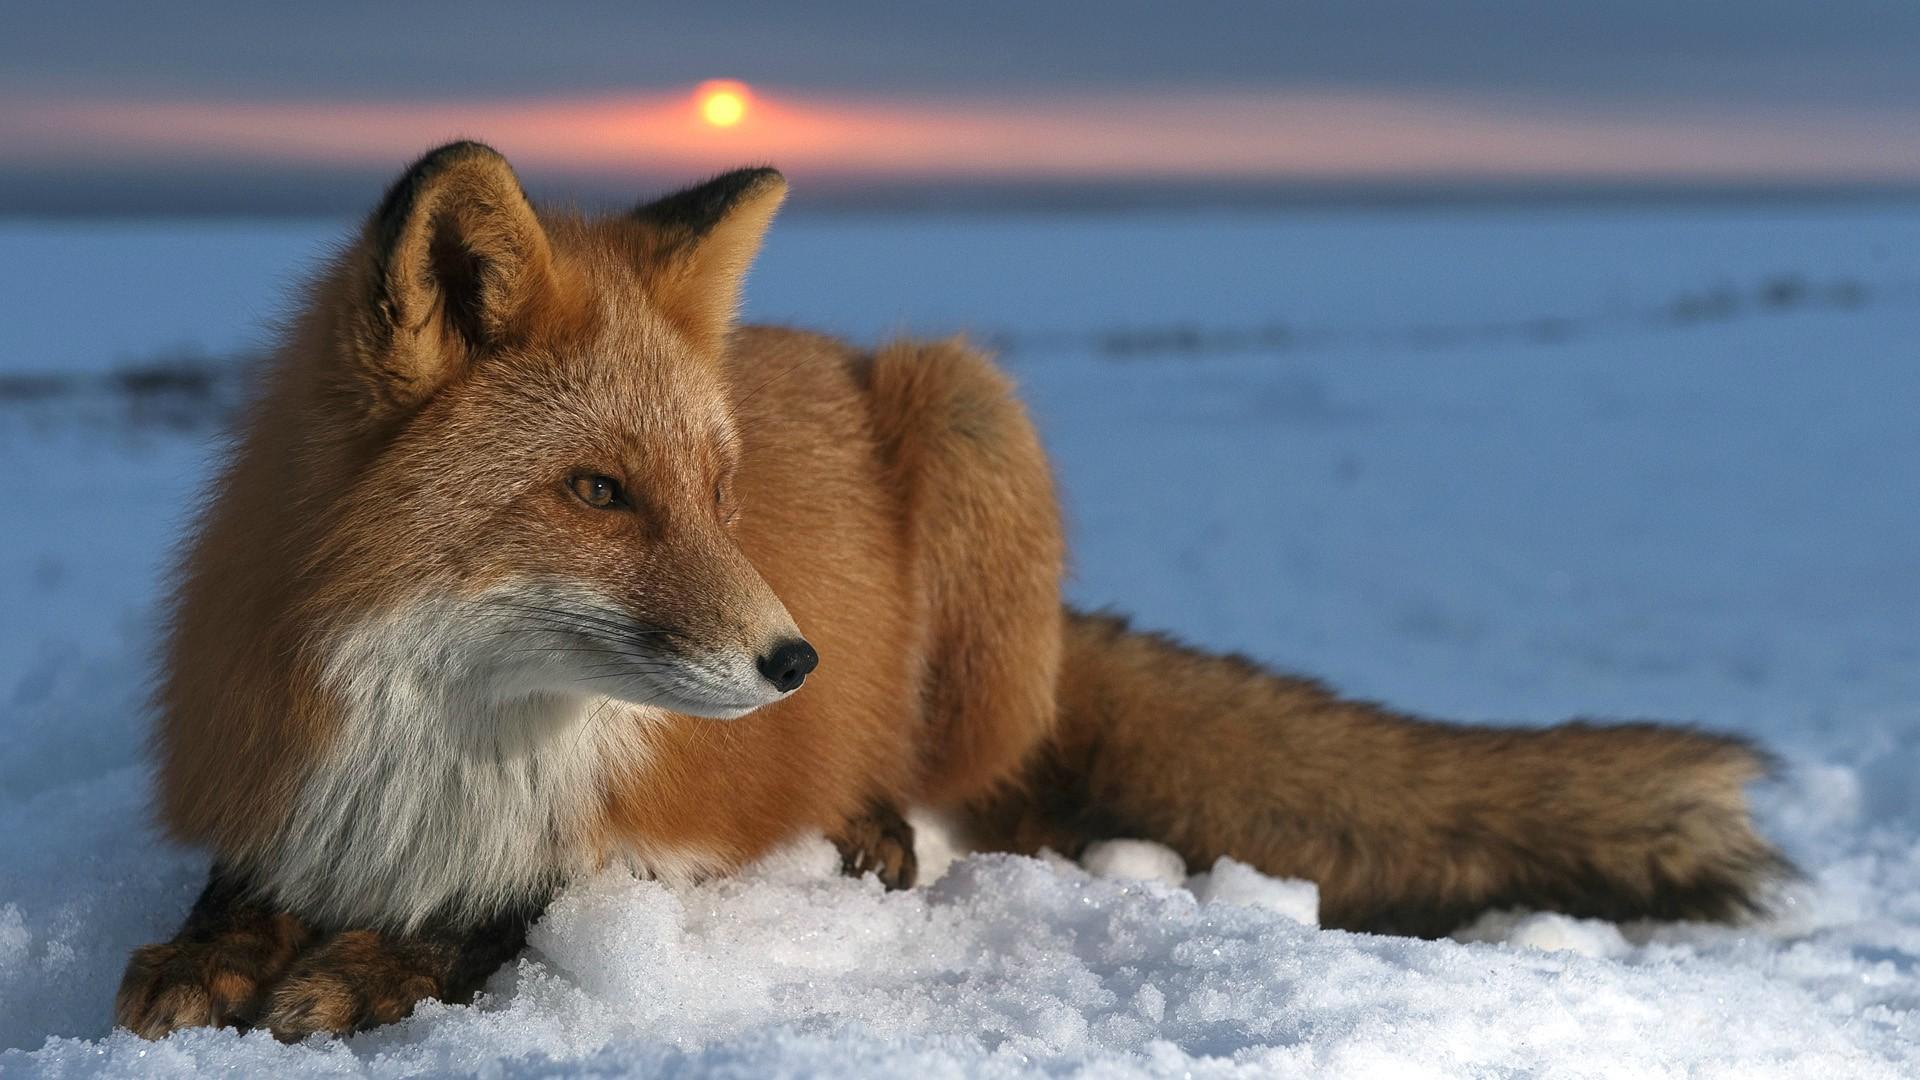 Fox Wallpaper